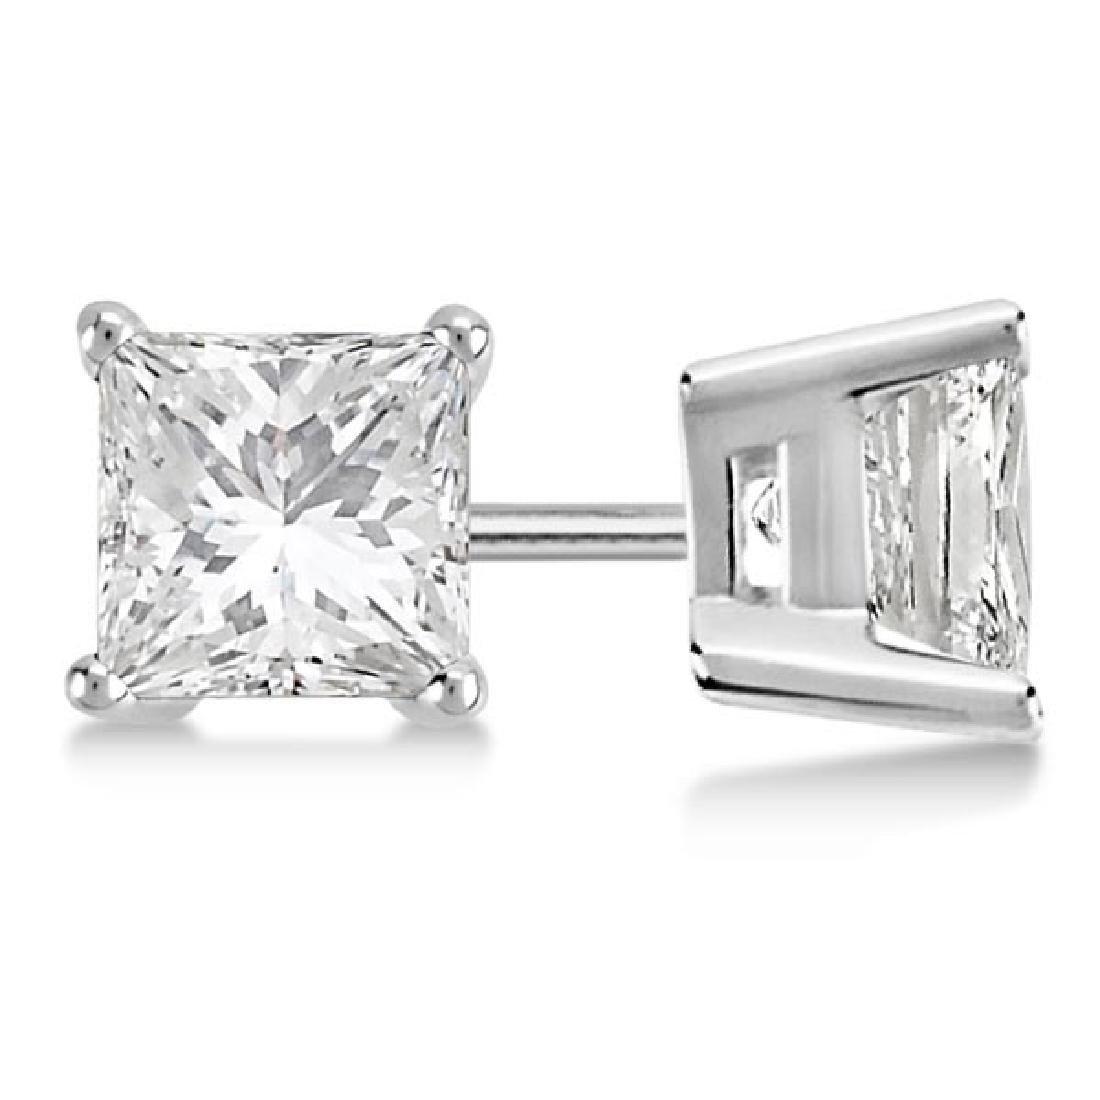 Certified 1.03 CTW Princess Diamond Stud Earrings I/SI1